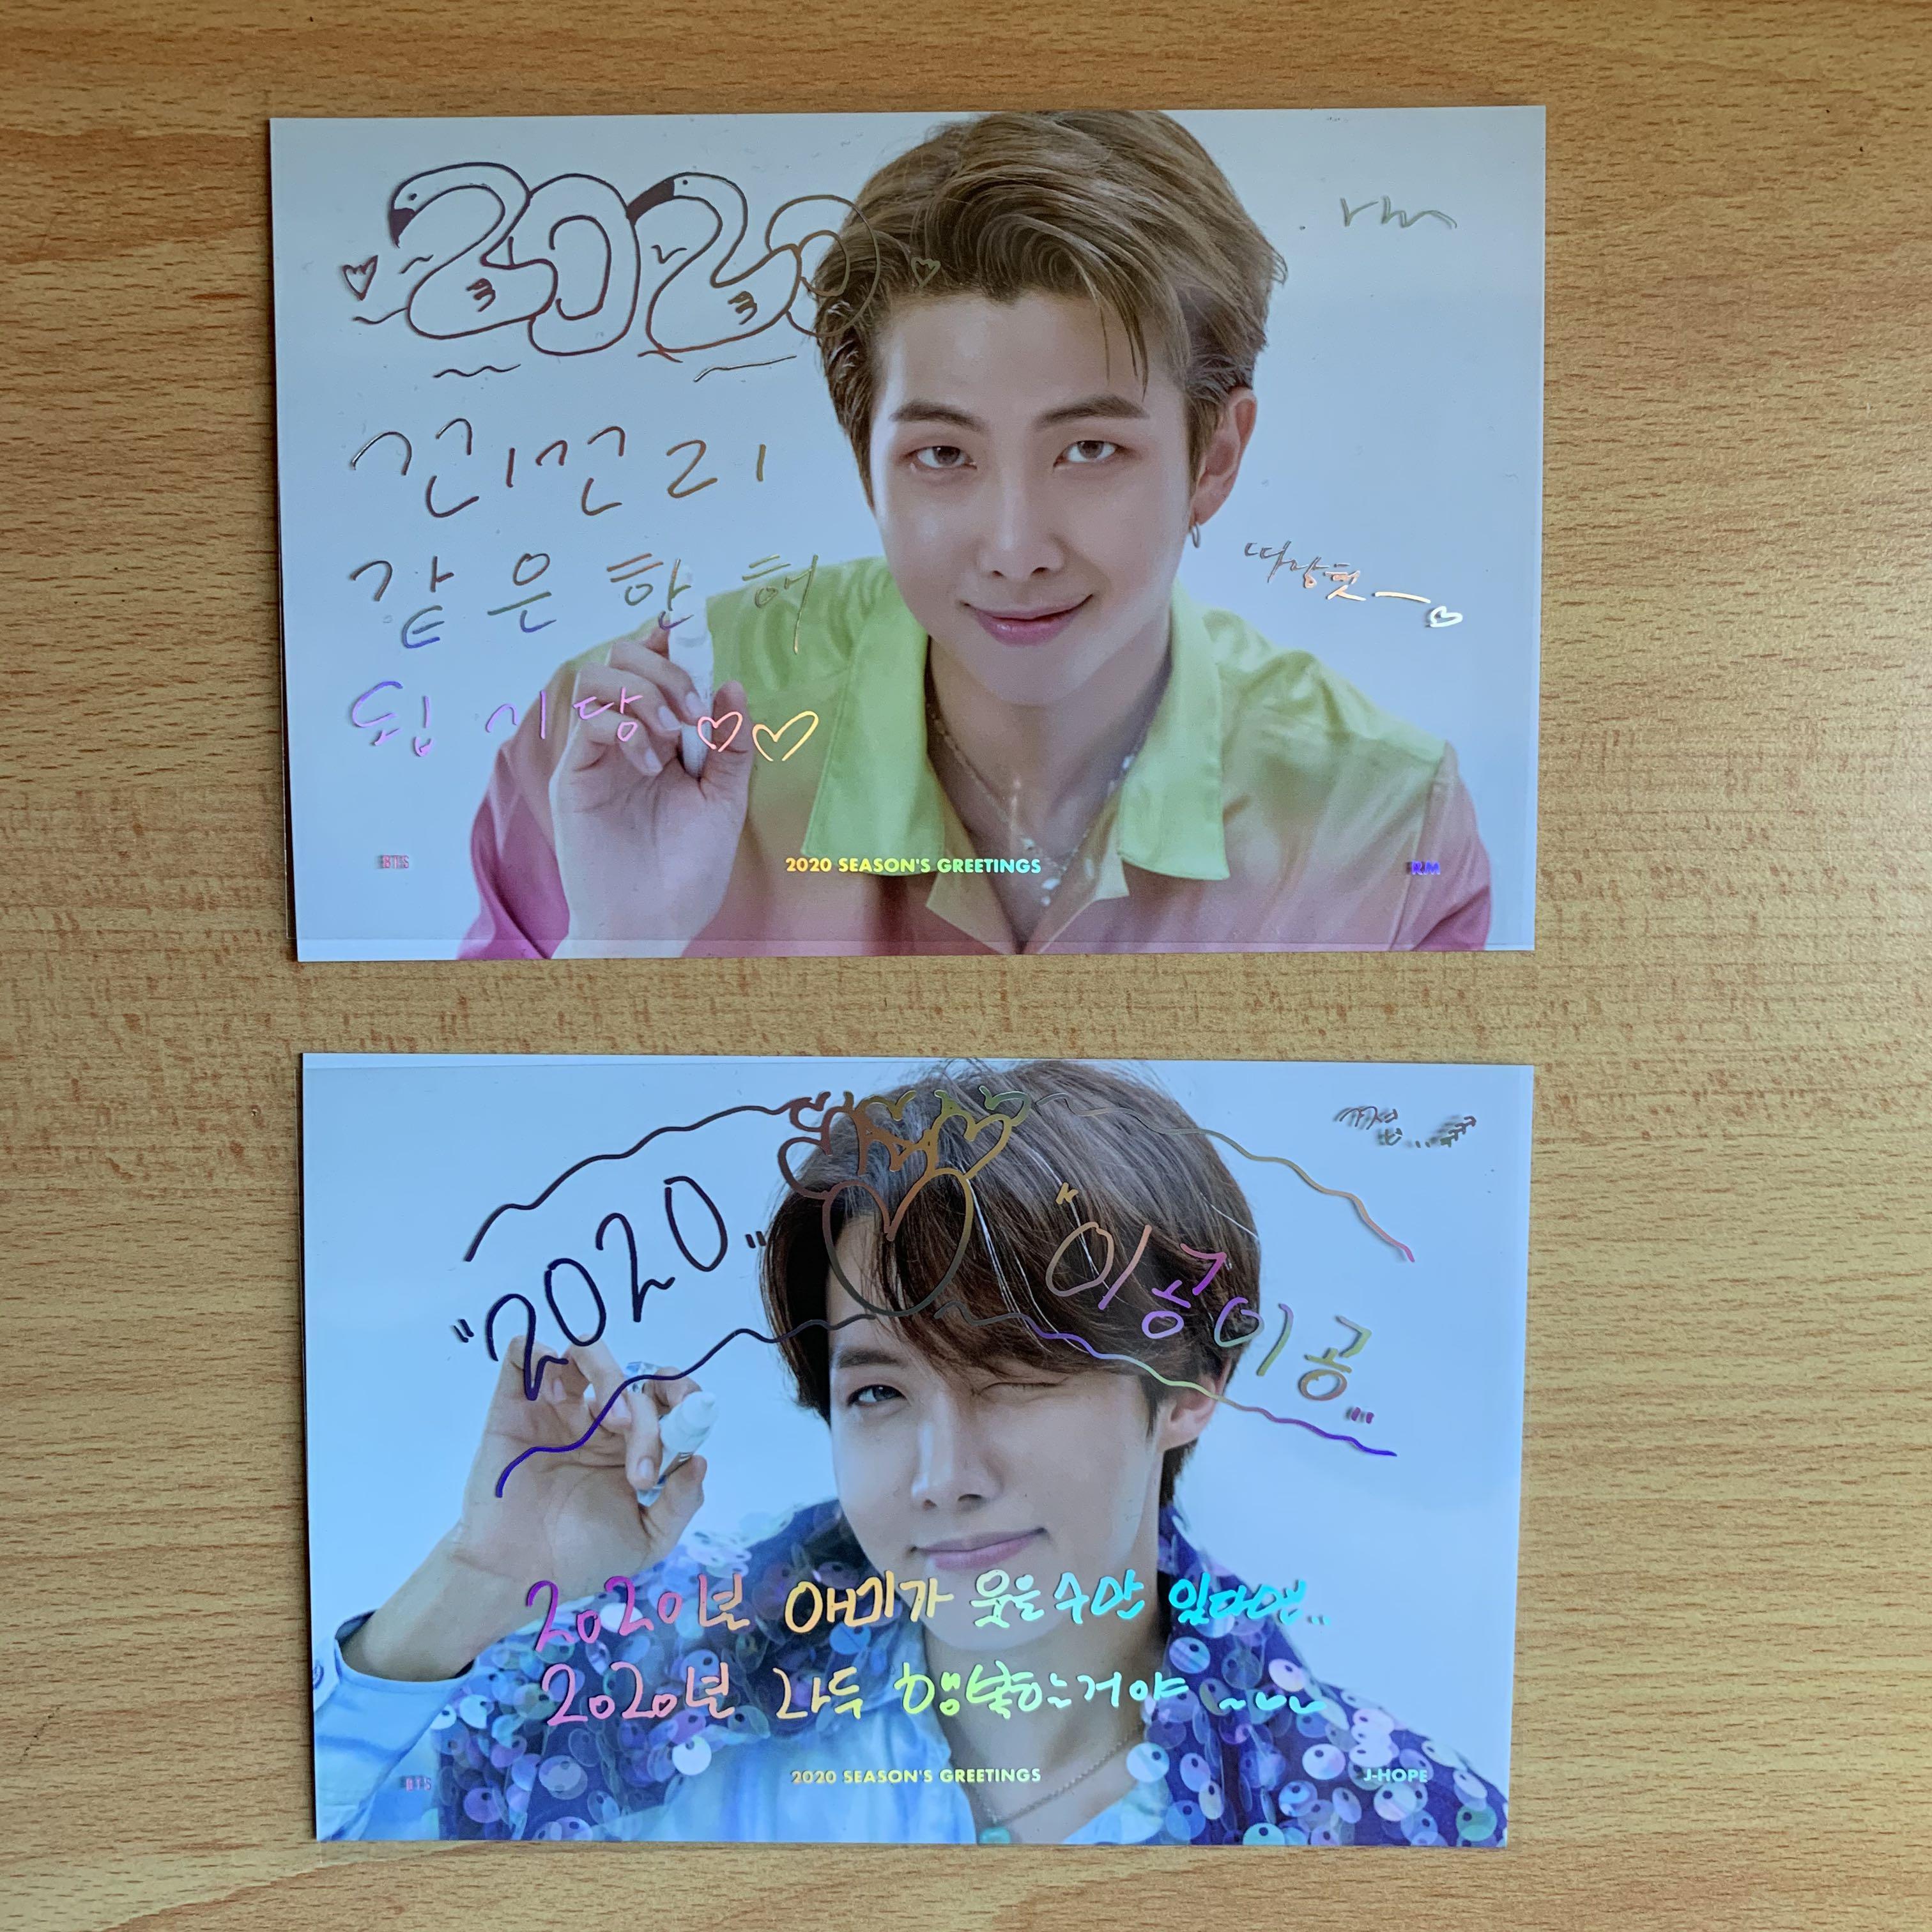 GREETING MESSAGE CARD - BTS 2020 SEASON'S GREETINGS